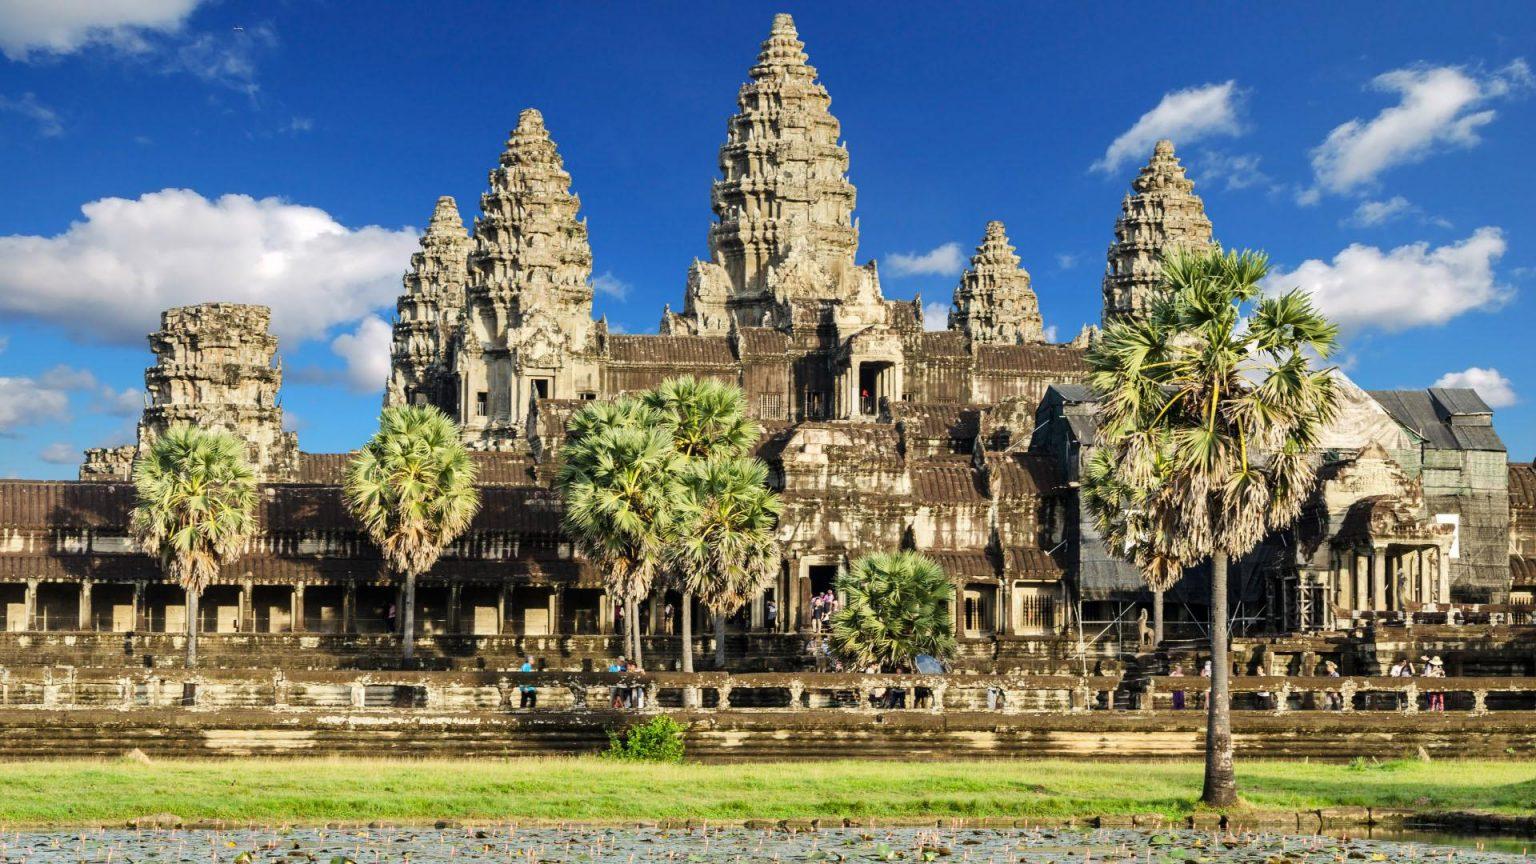 Siem Reap, Cambodia, Камбоджа, Angkor wat